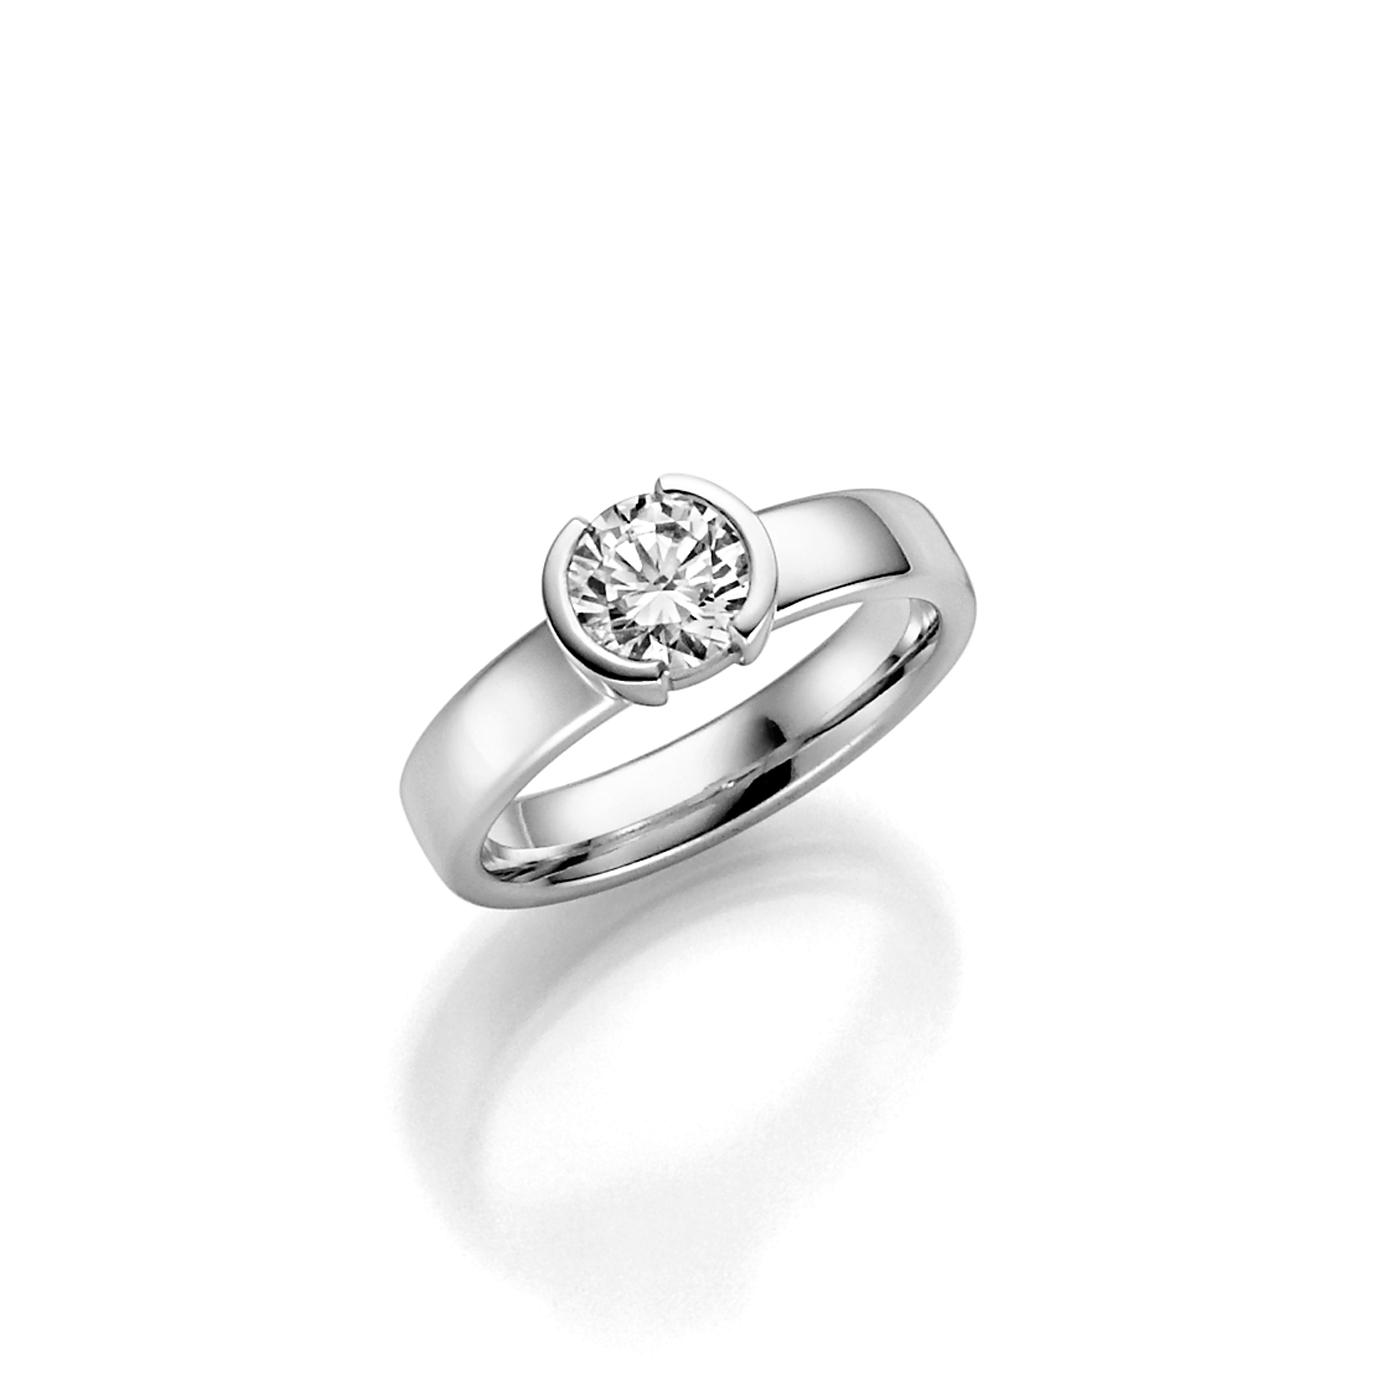 Vigselring 18k vitguld Rhen 1,0 ct diamant